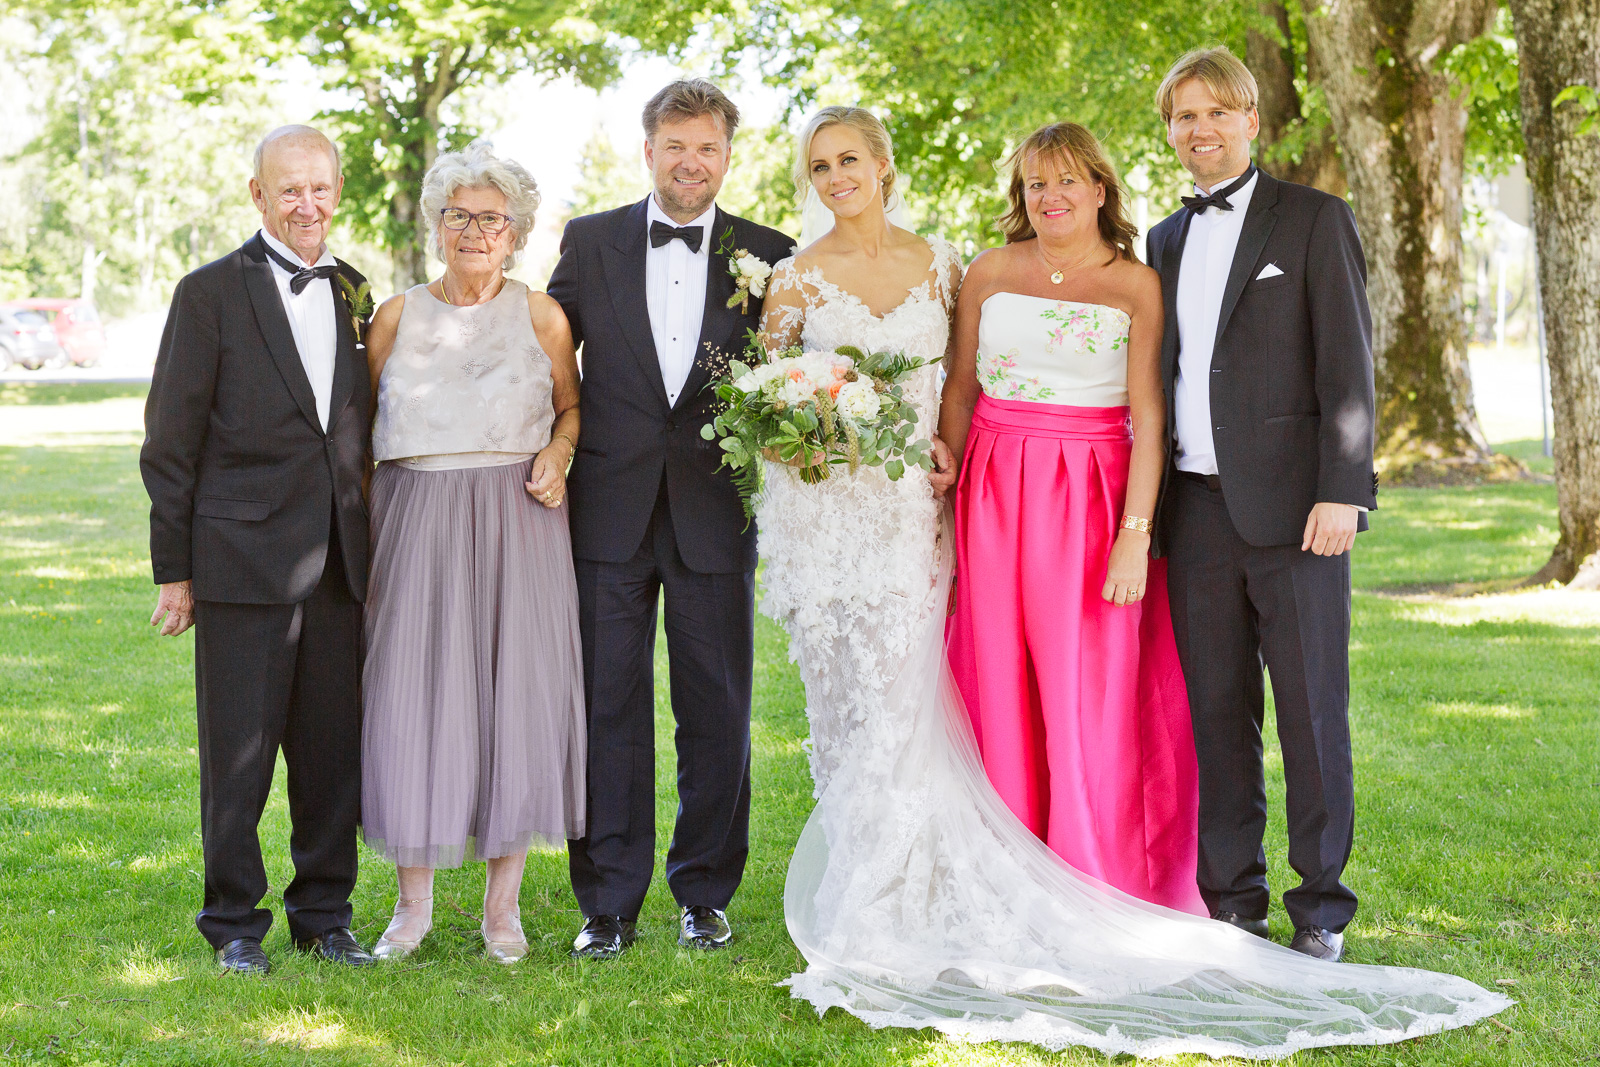 43 Støtvig hotel bryllup